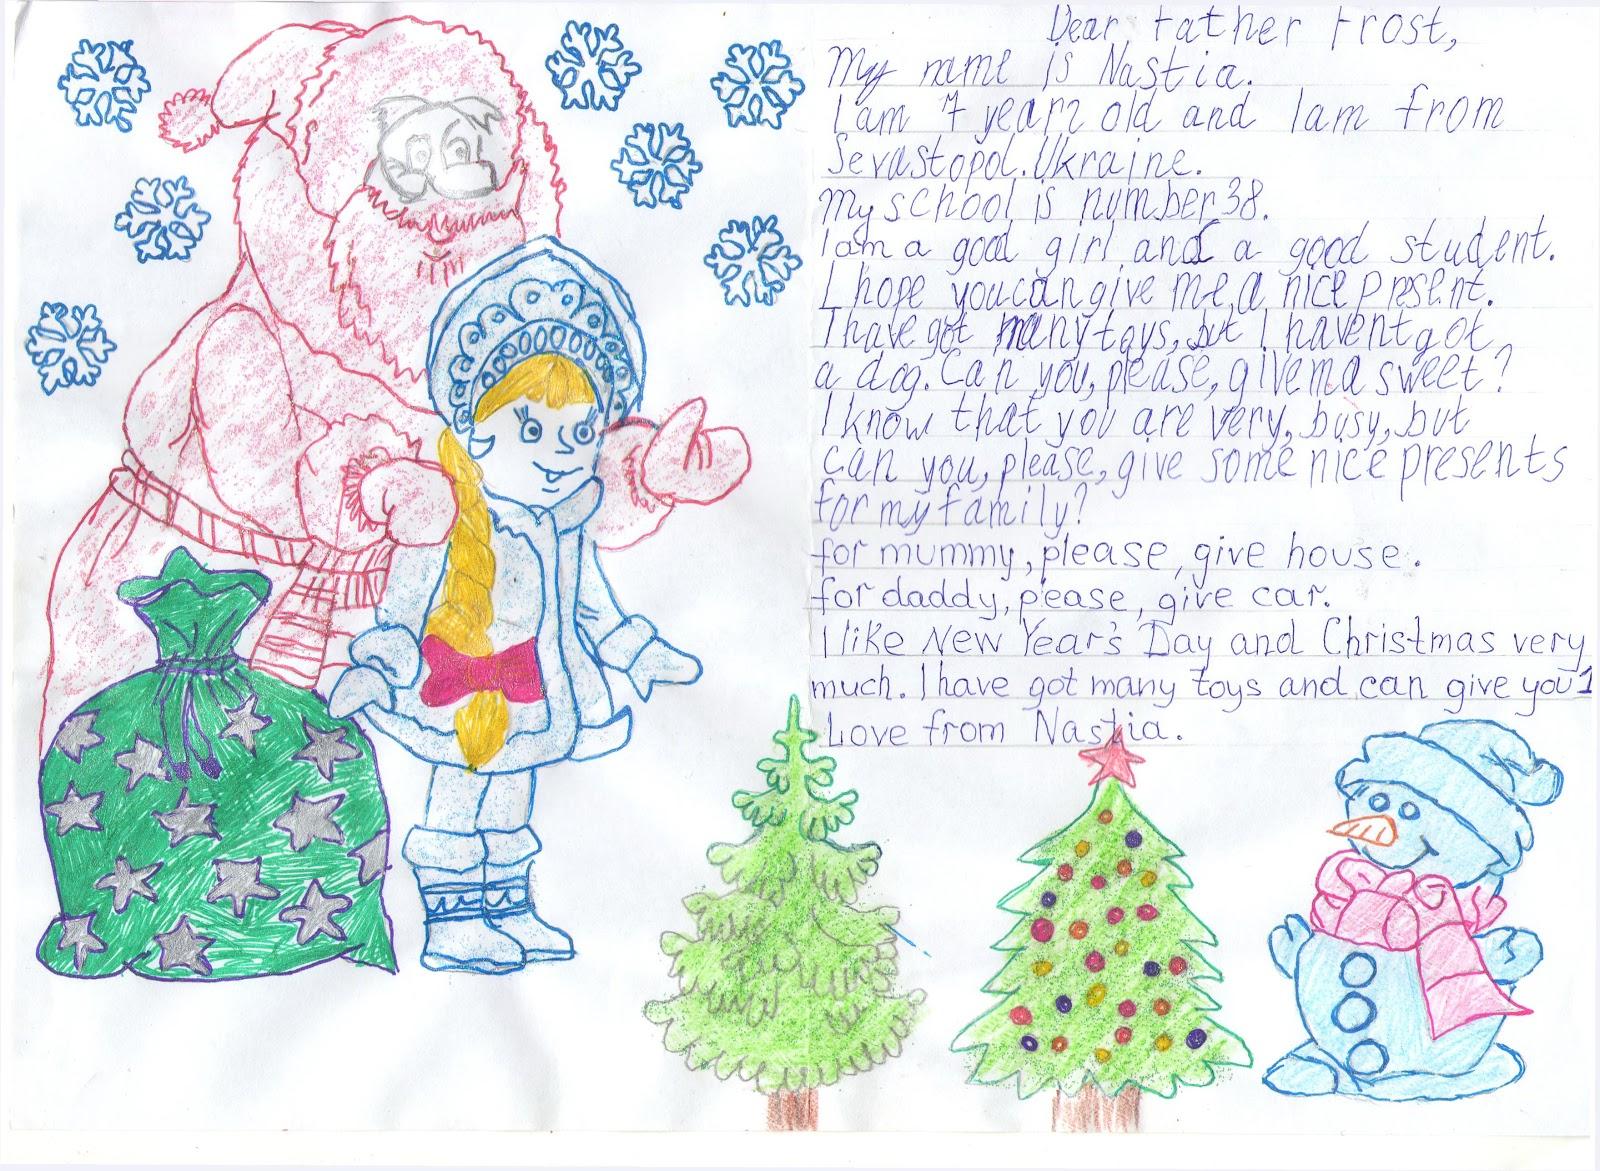 CHRISTMAS CARDS EXCHANGE PROJECT. Secondary school#38, Sevastopol ...